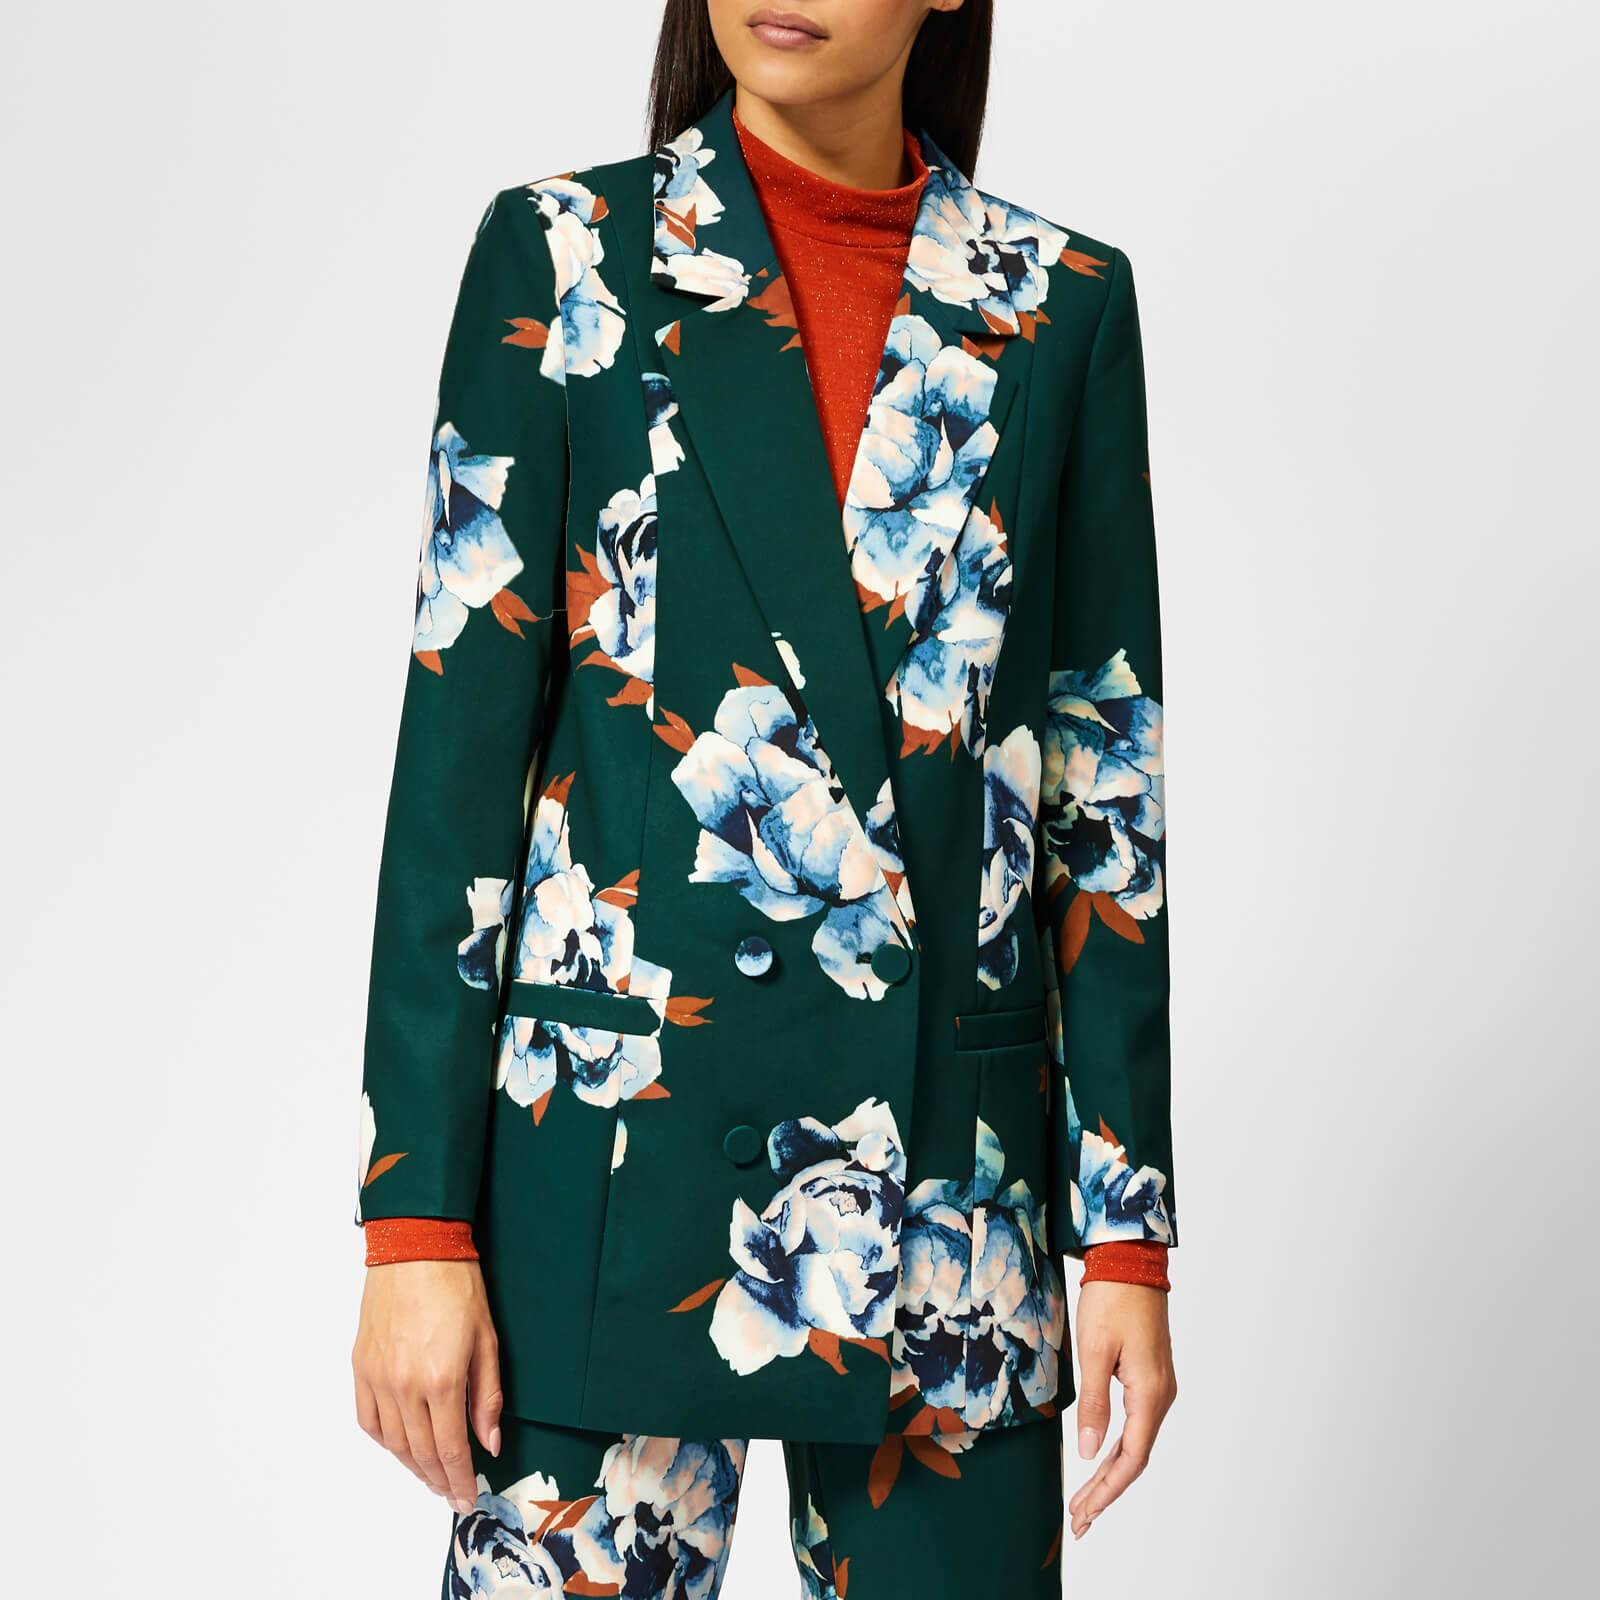 Gestuz Women's Fala Blazer - Deep Pine Flower - EU 36/UK 8 - Multi